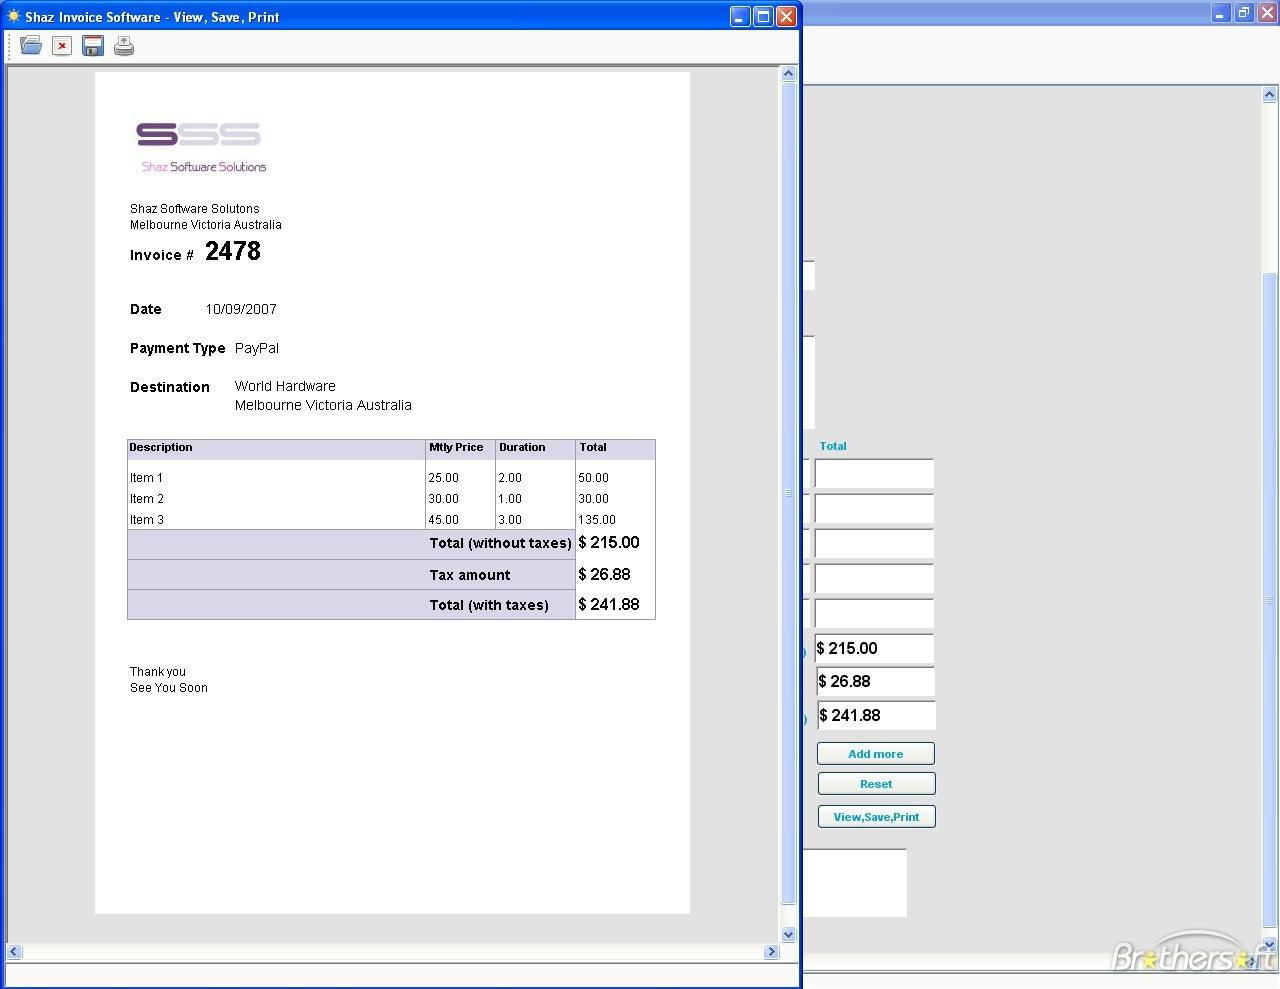 easy invoice software easy invoice software free invoice template free 2016 1280 X 989